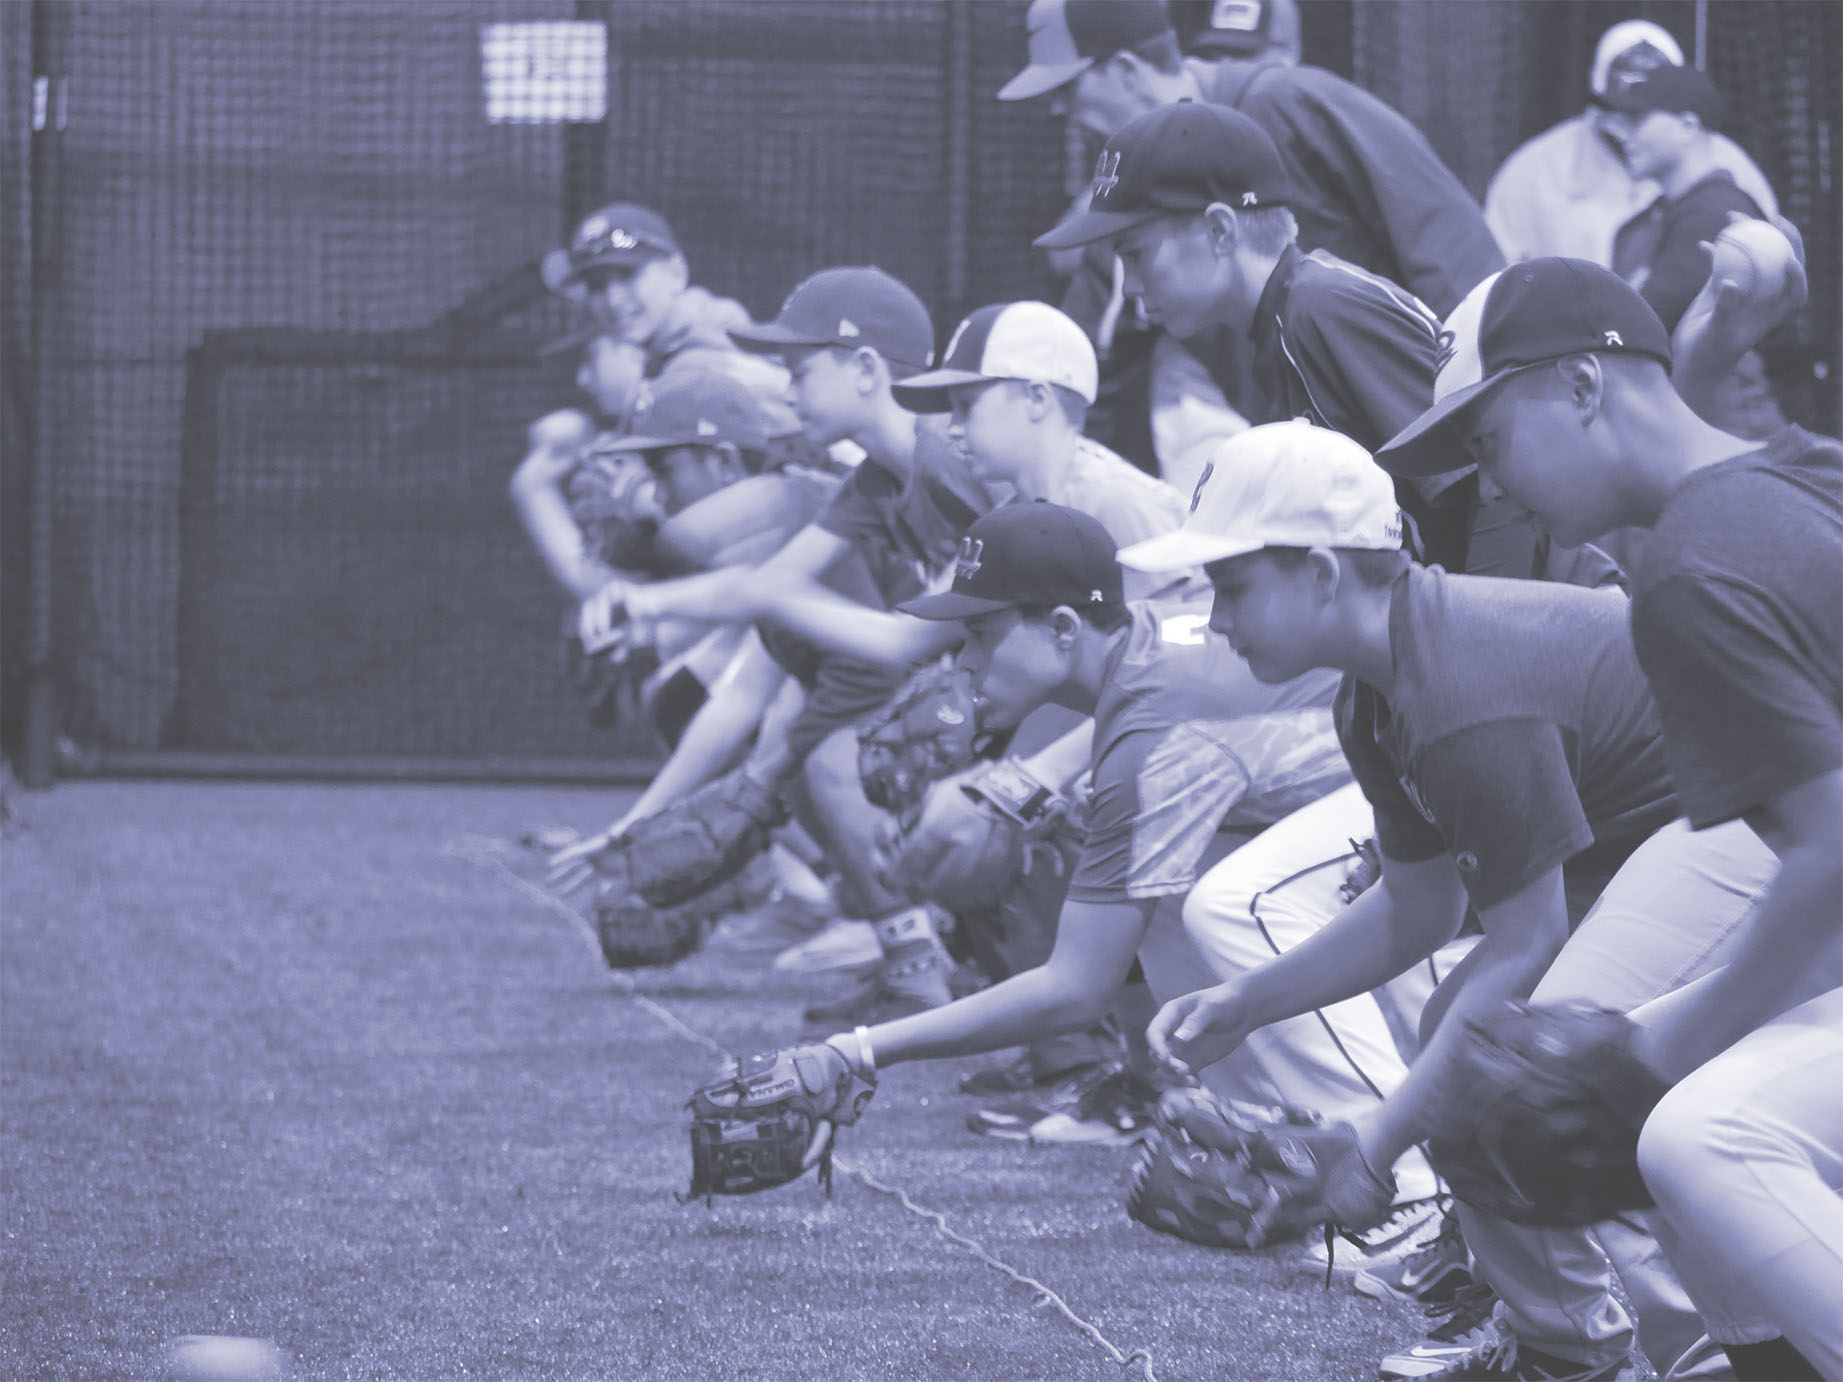 Fielding Academy (11/3-12/15/18)